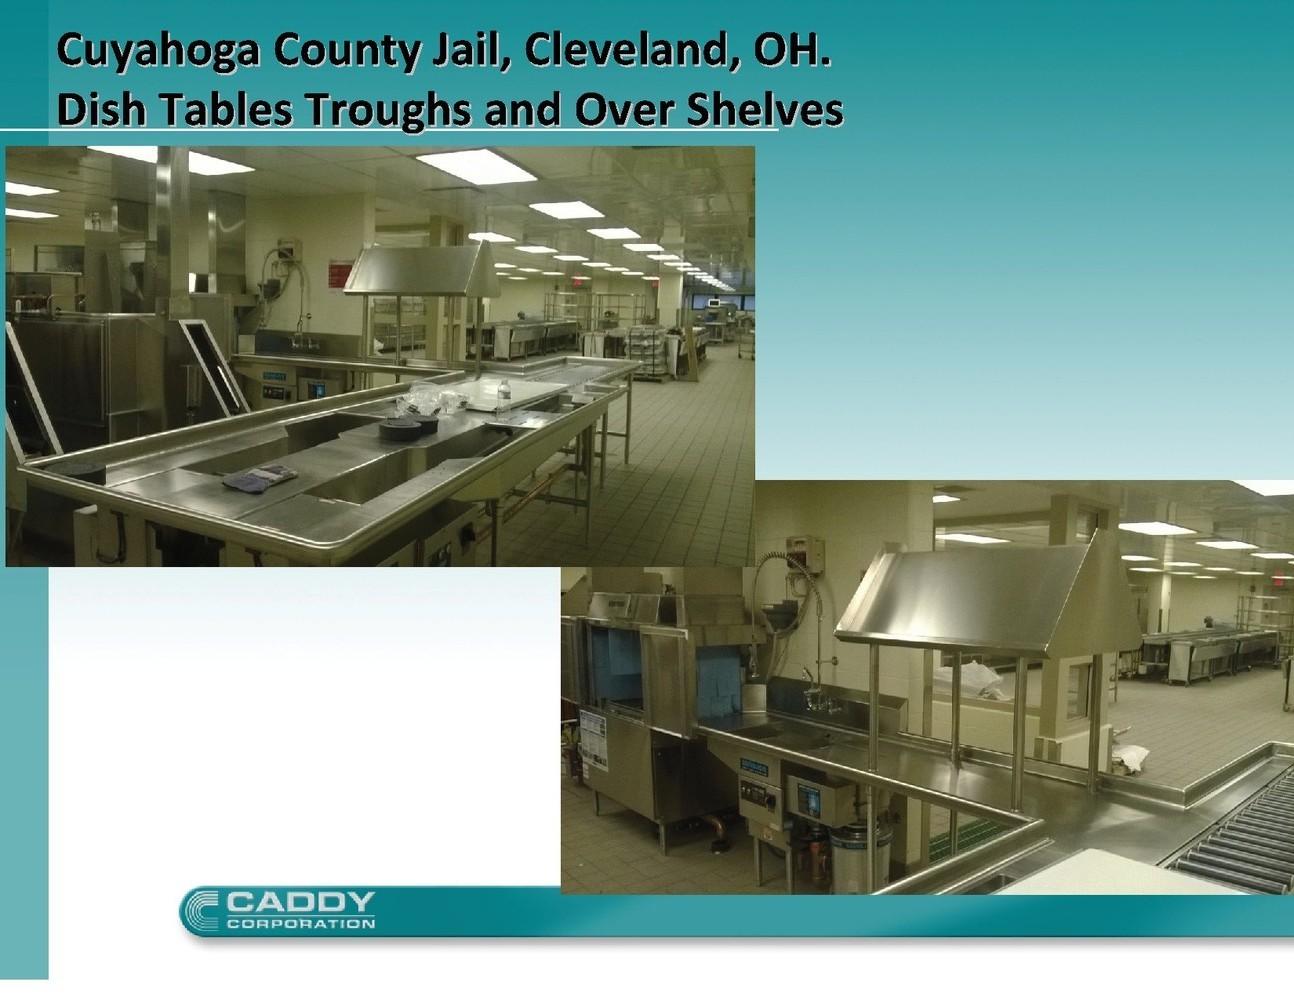 Caddy Corporation - Project Spotlight - Cuyahoga County Jail